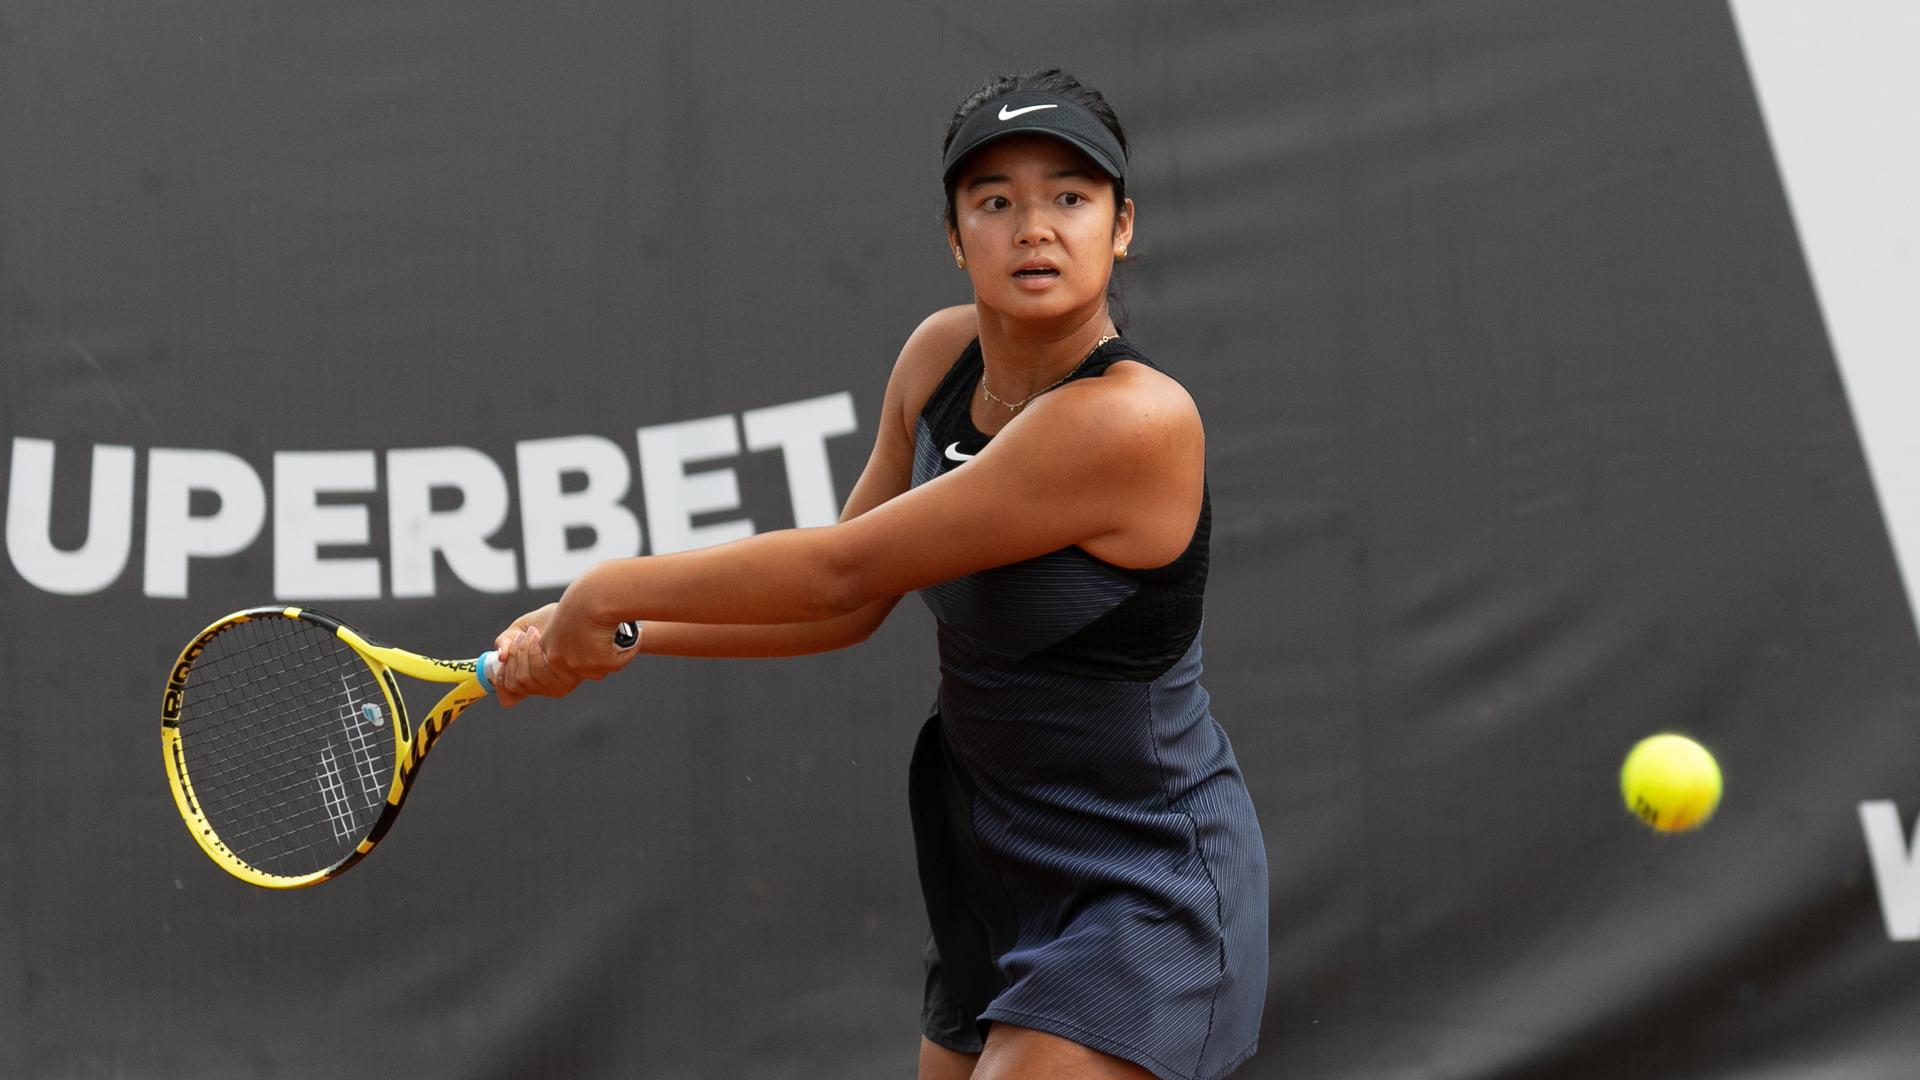 Alex Eala women's tennis rank